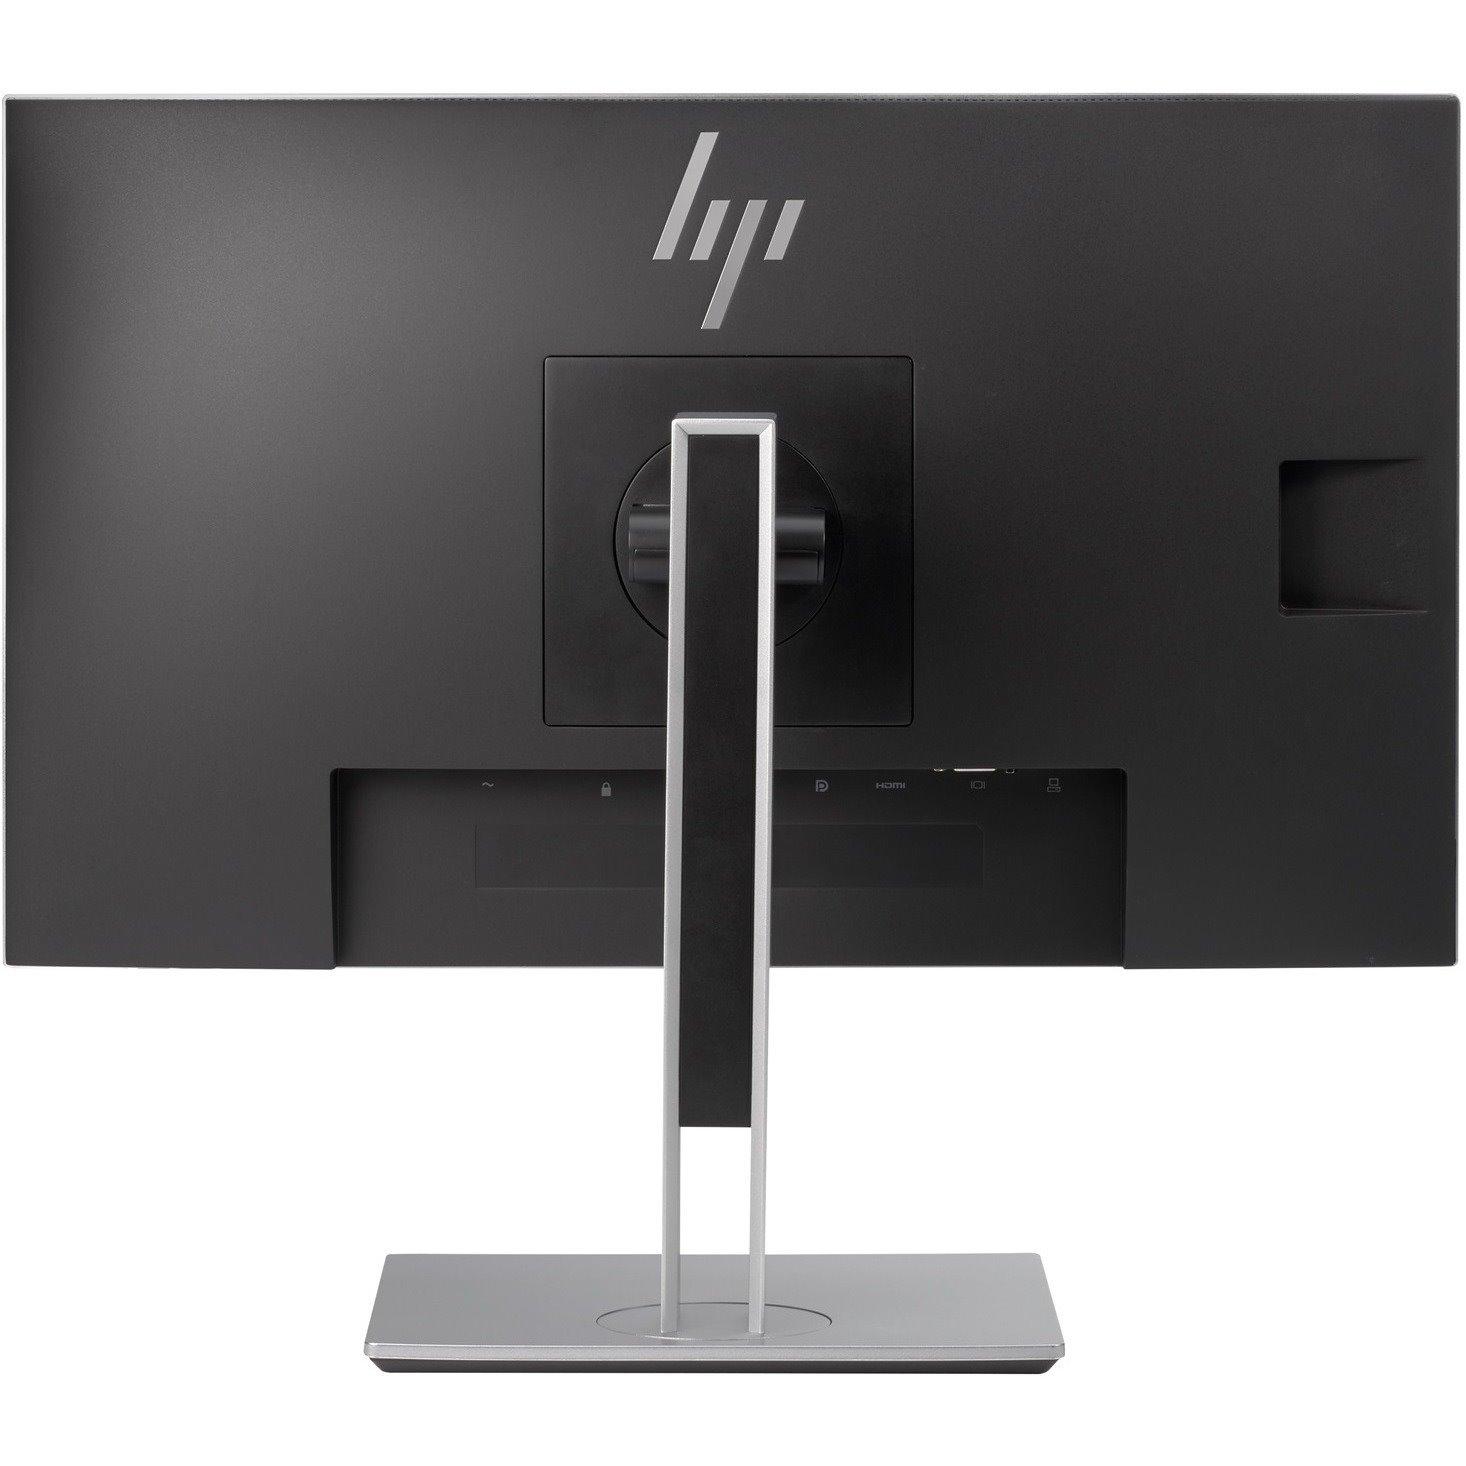 "HP Business E233 58.4 cm (23"") Full HD LED LCD Monitor - 16:9 - Black"